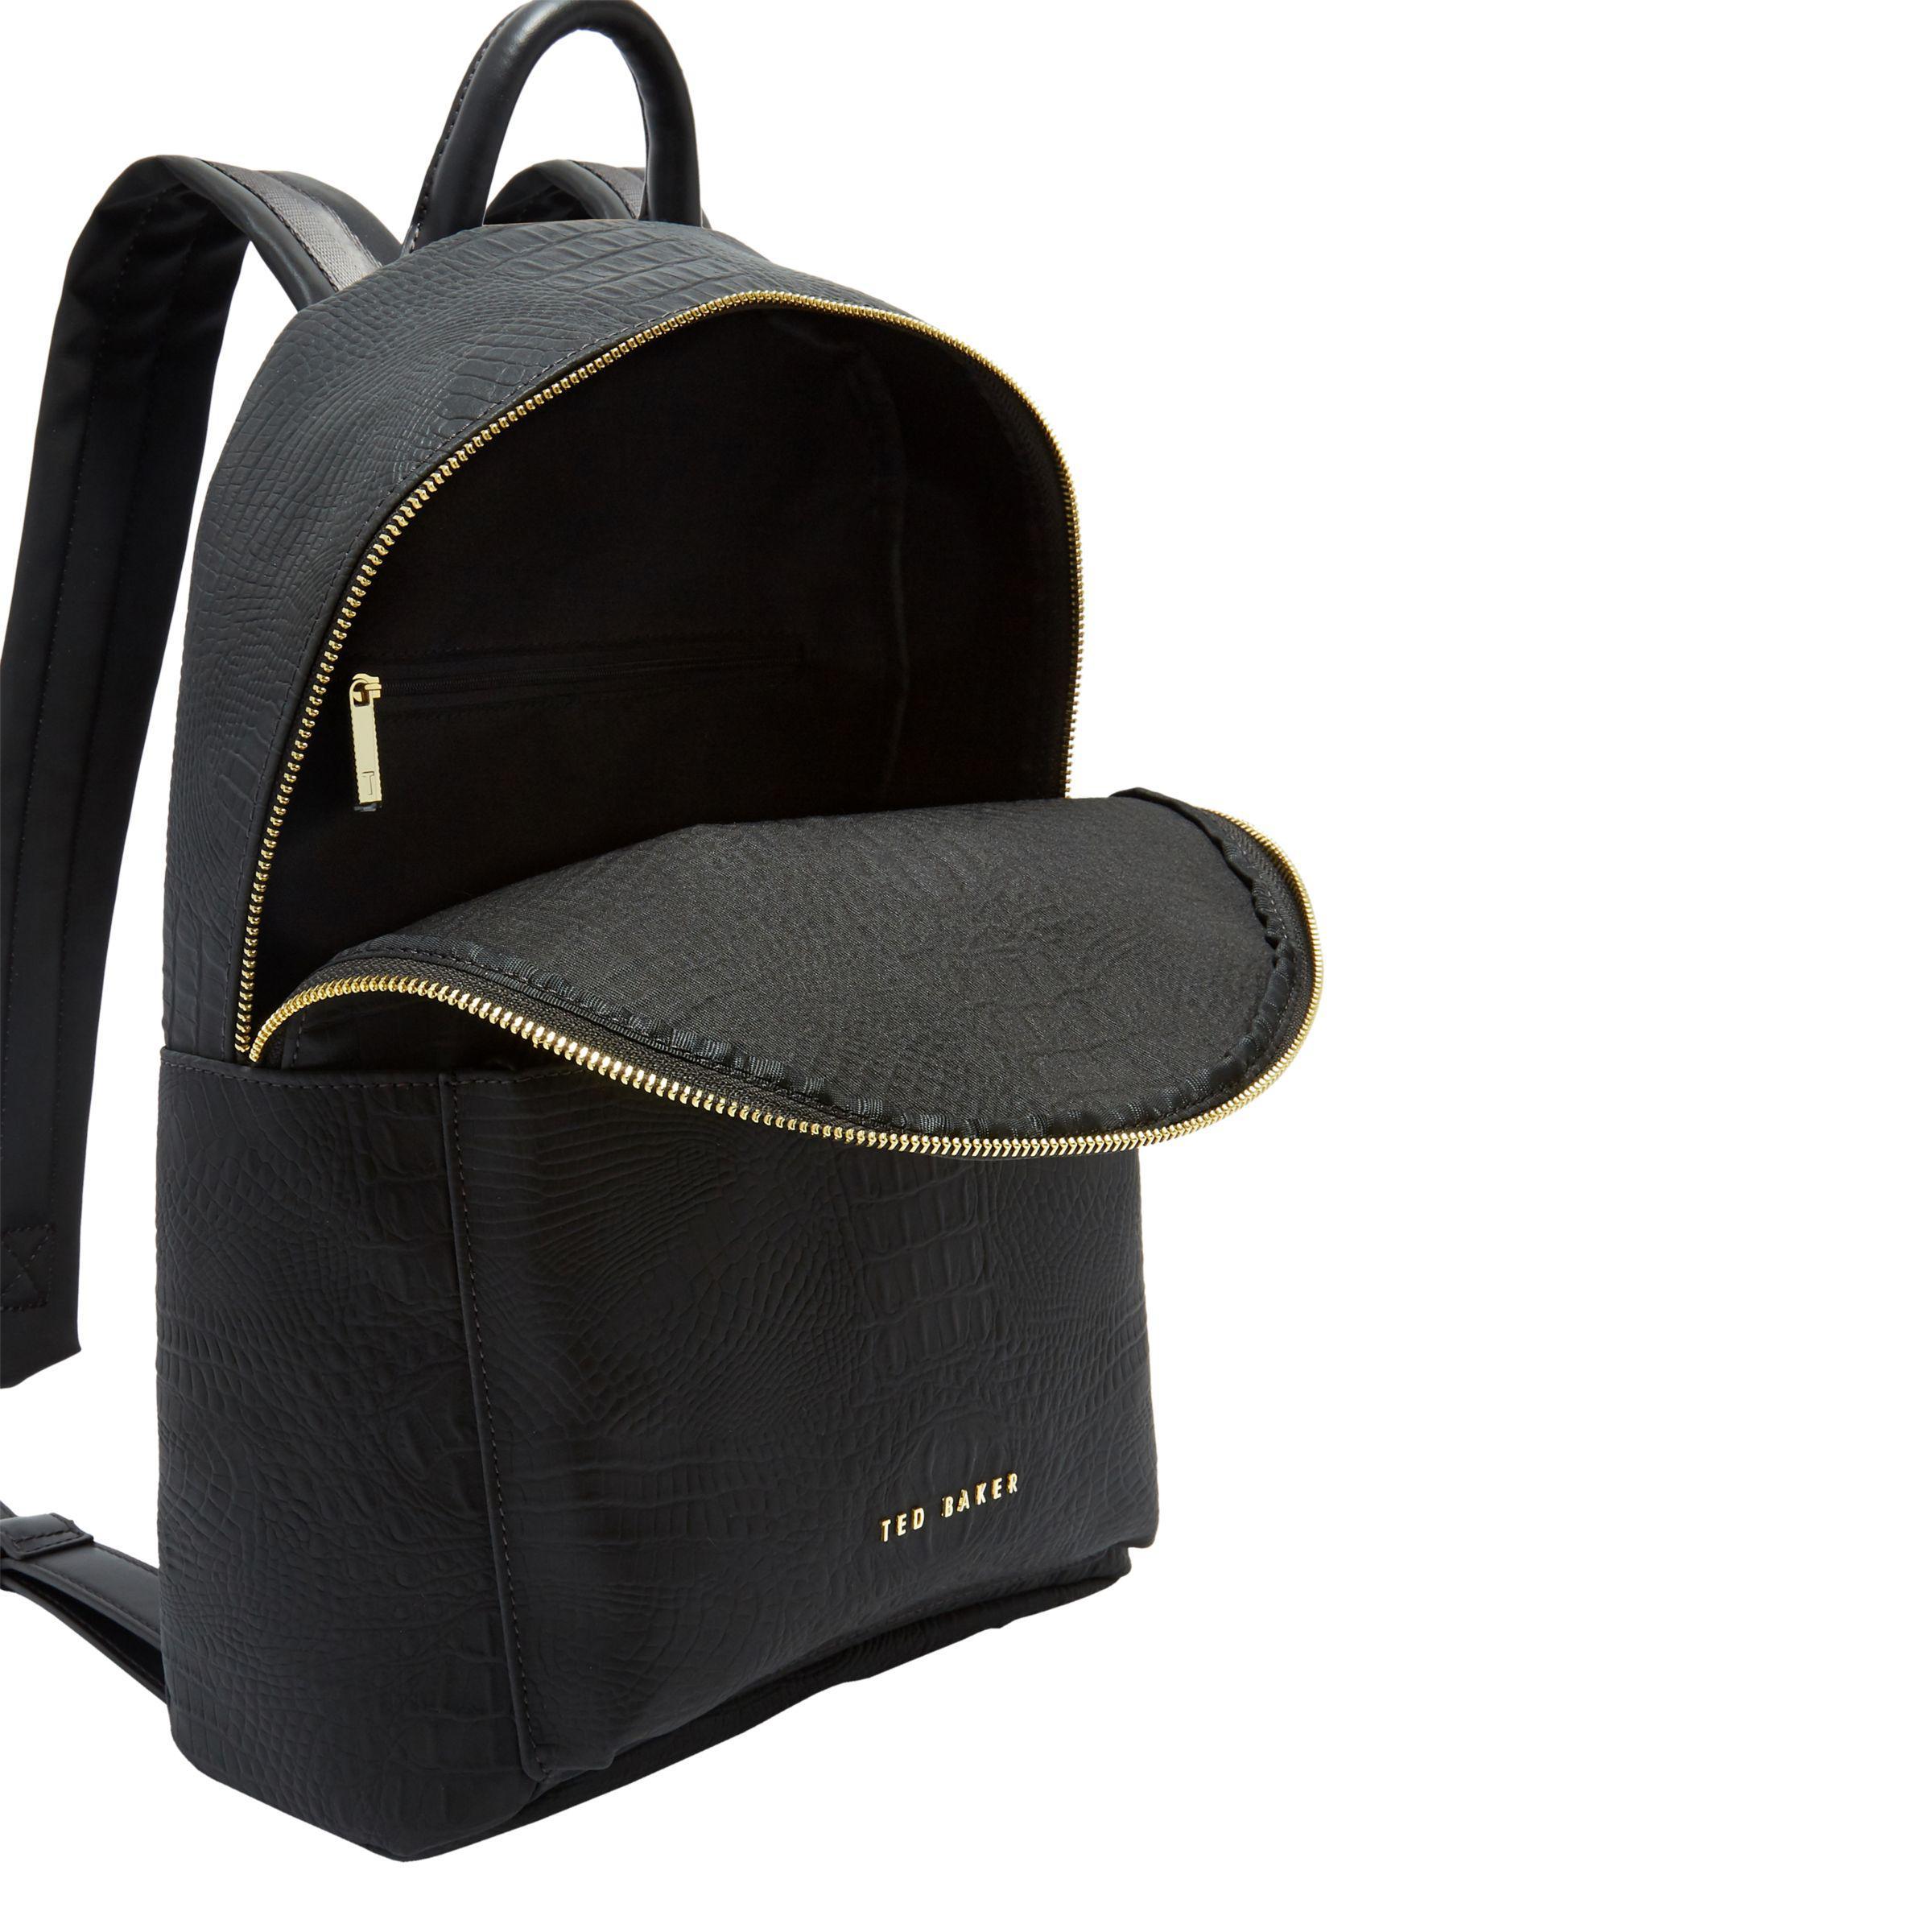 27e686ead72c Ted Baker Creaala Leather Croc Effect Backpack in Black - Lyst